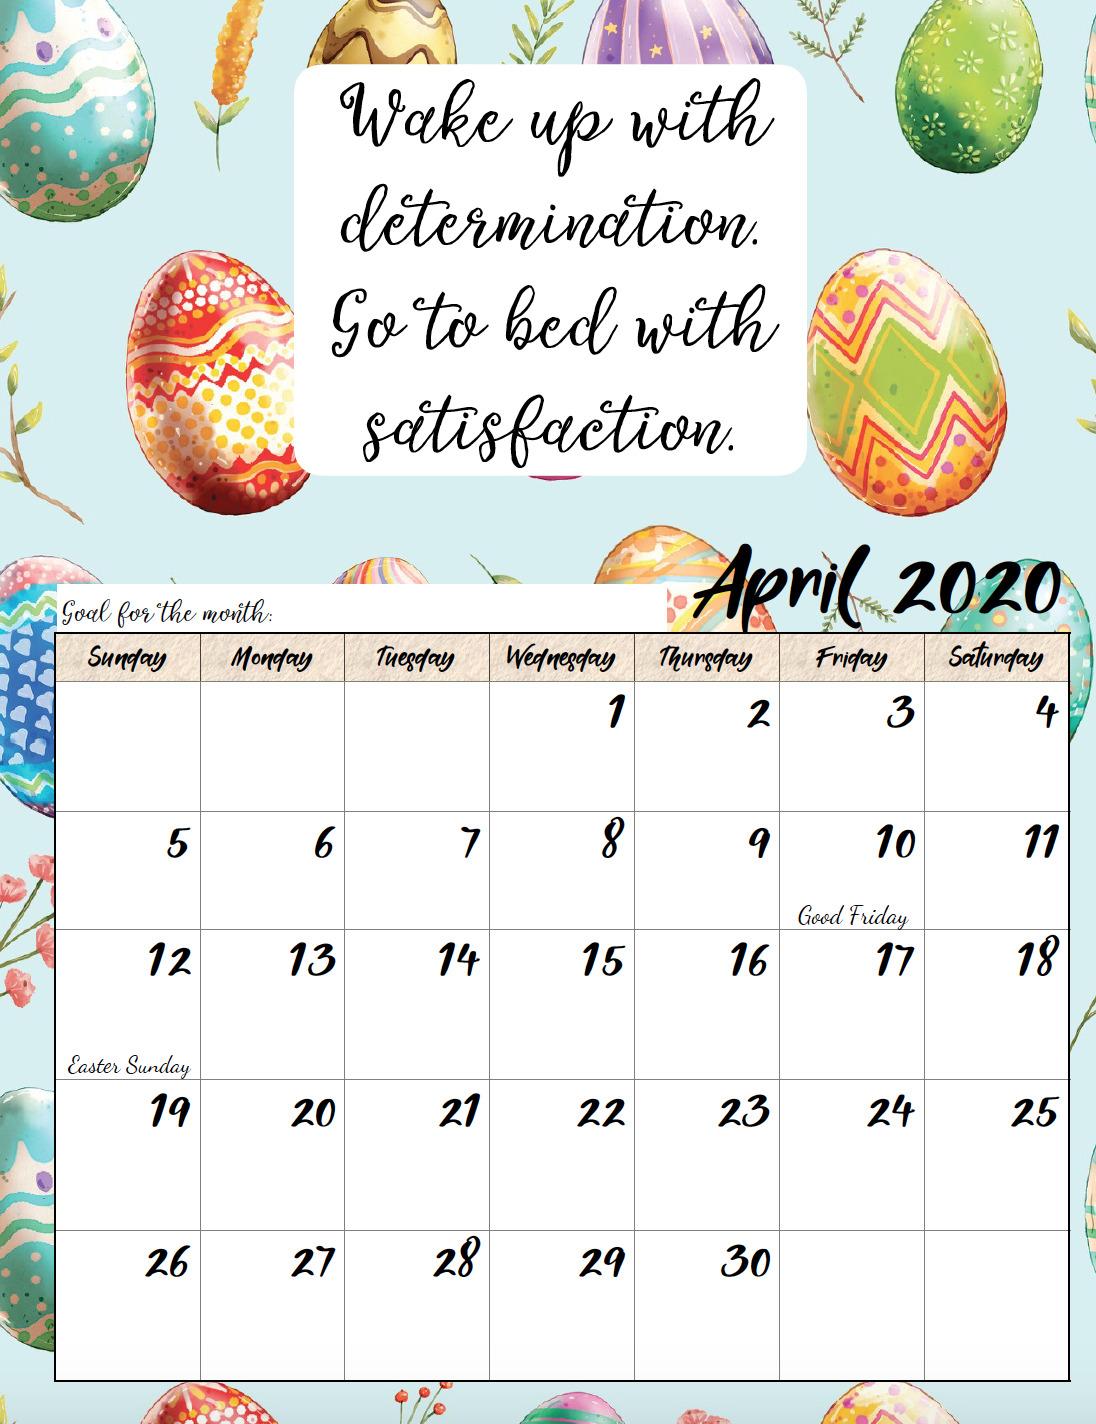 Free printable April 2020 monthly motivational calendar.